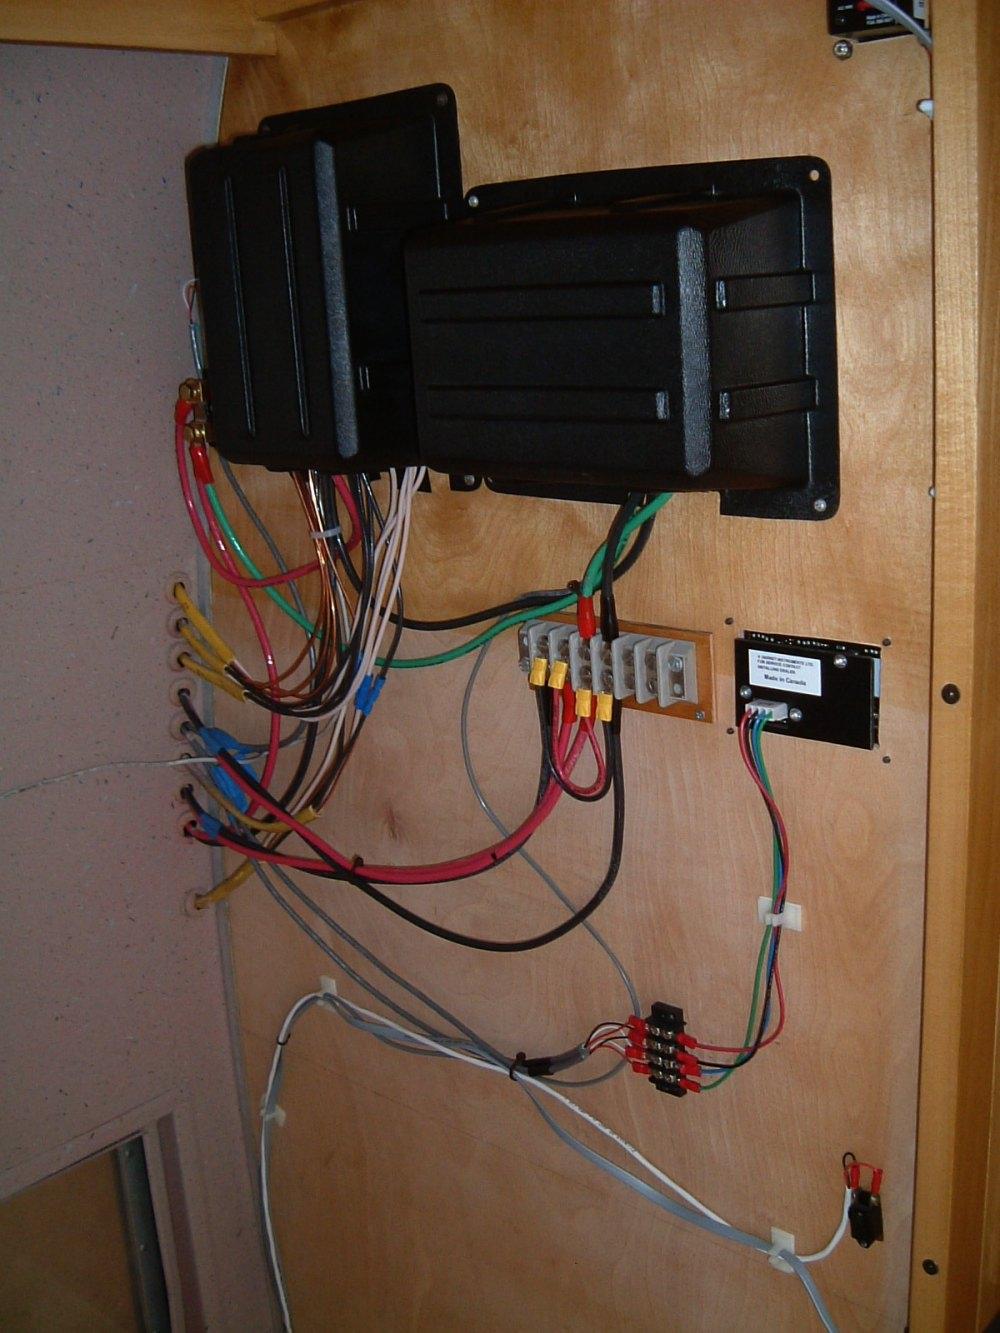 Wiring A Lighting Circuit Diagram Electrical Wiring Vintage Airstream